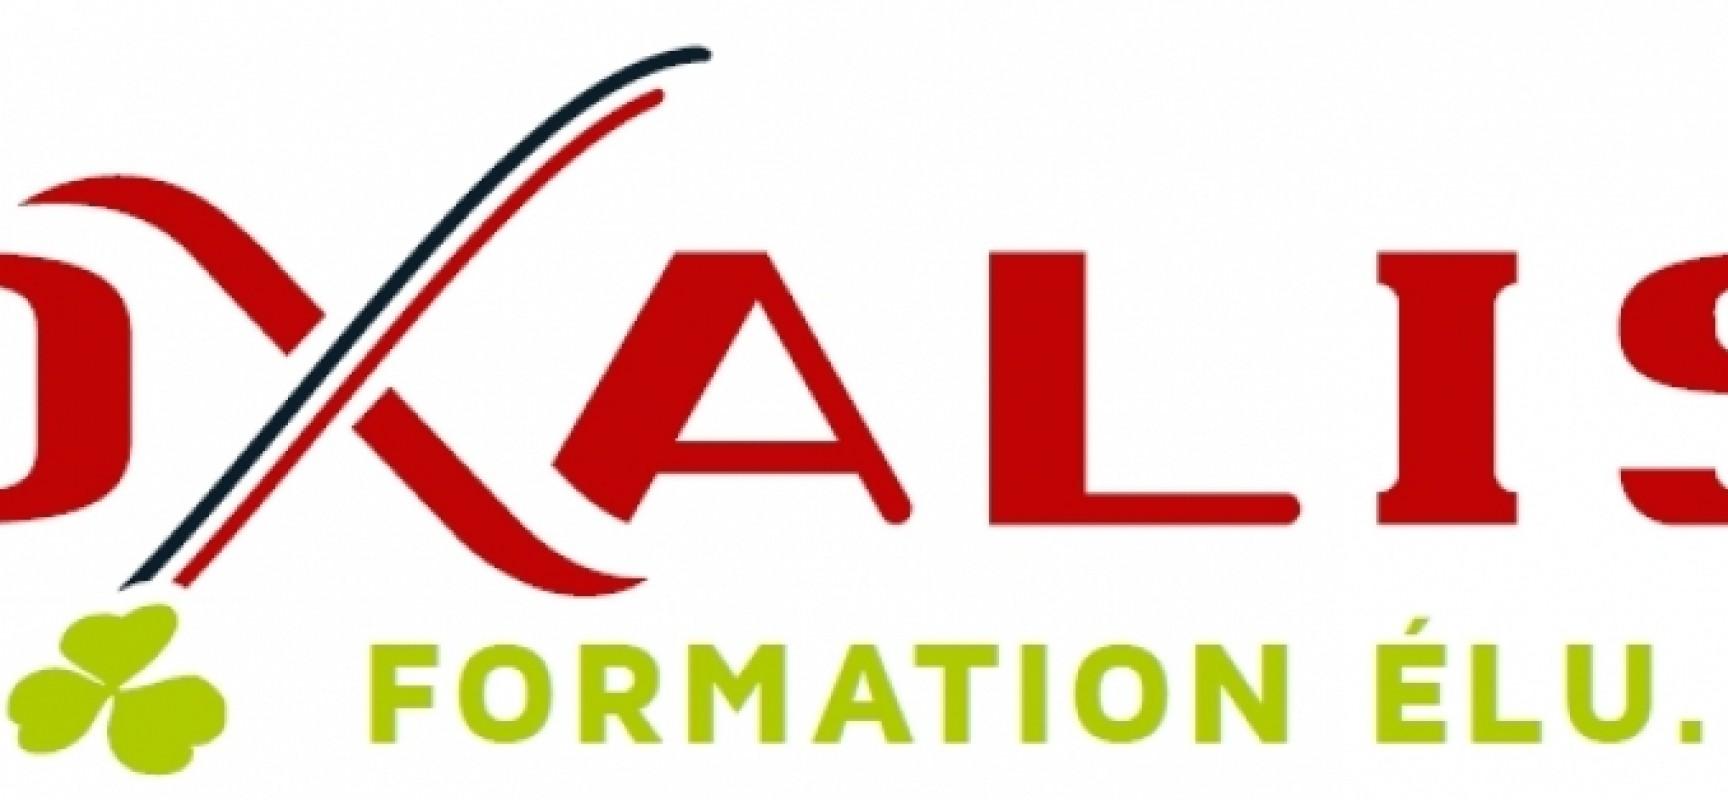 Oxalis – Formations élu-es en Creuse